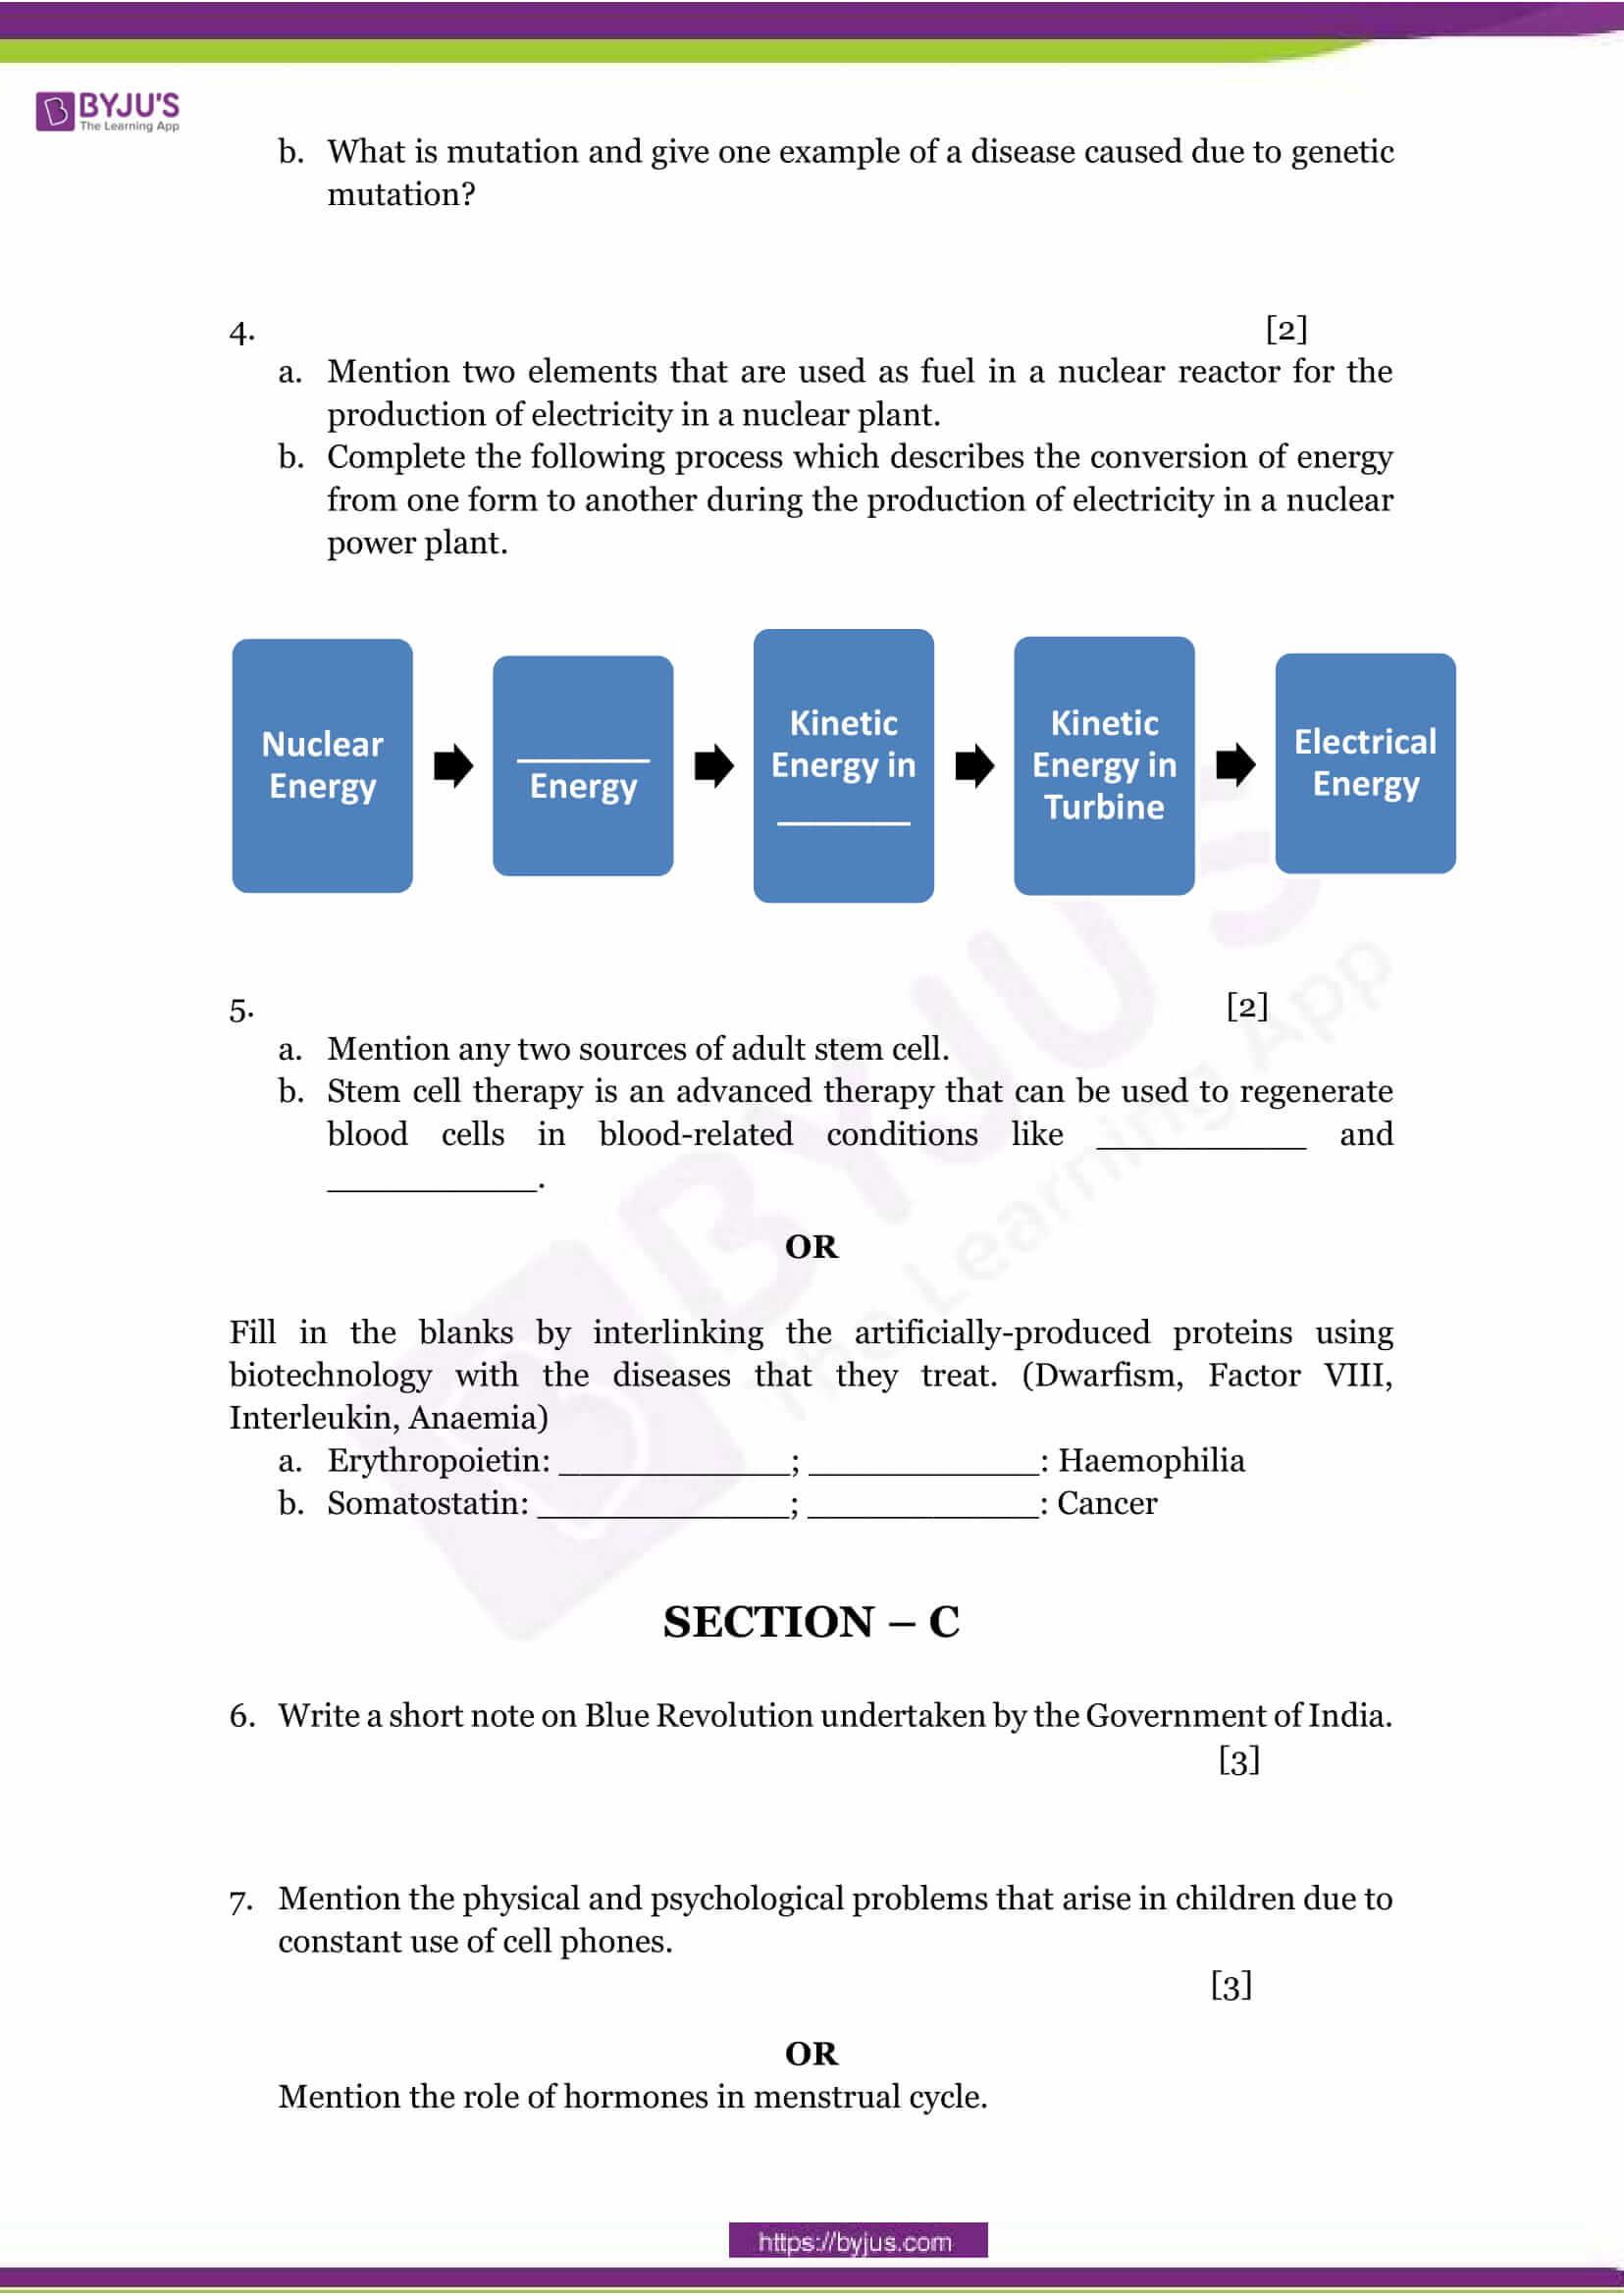 CBSE Class 10 Science Sample Paper Set 1-2